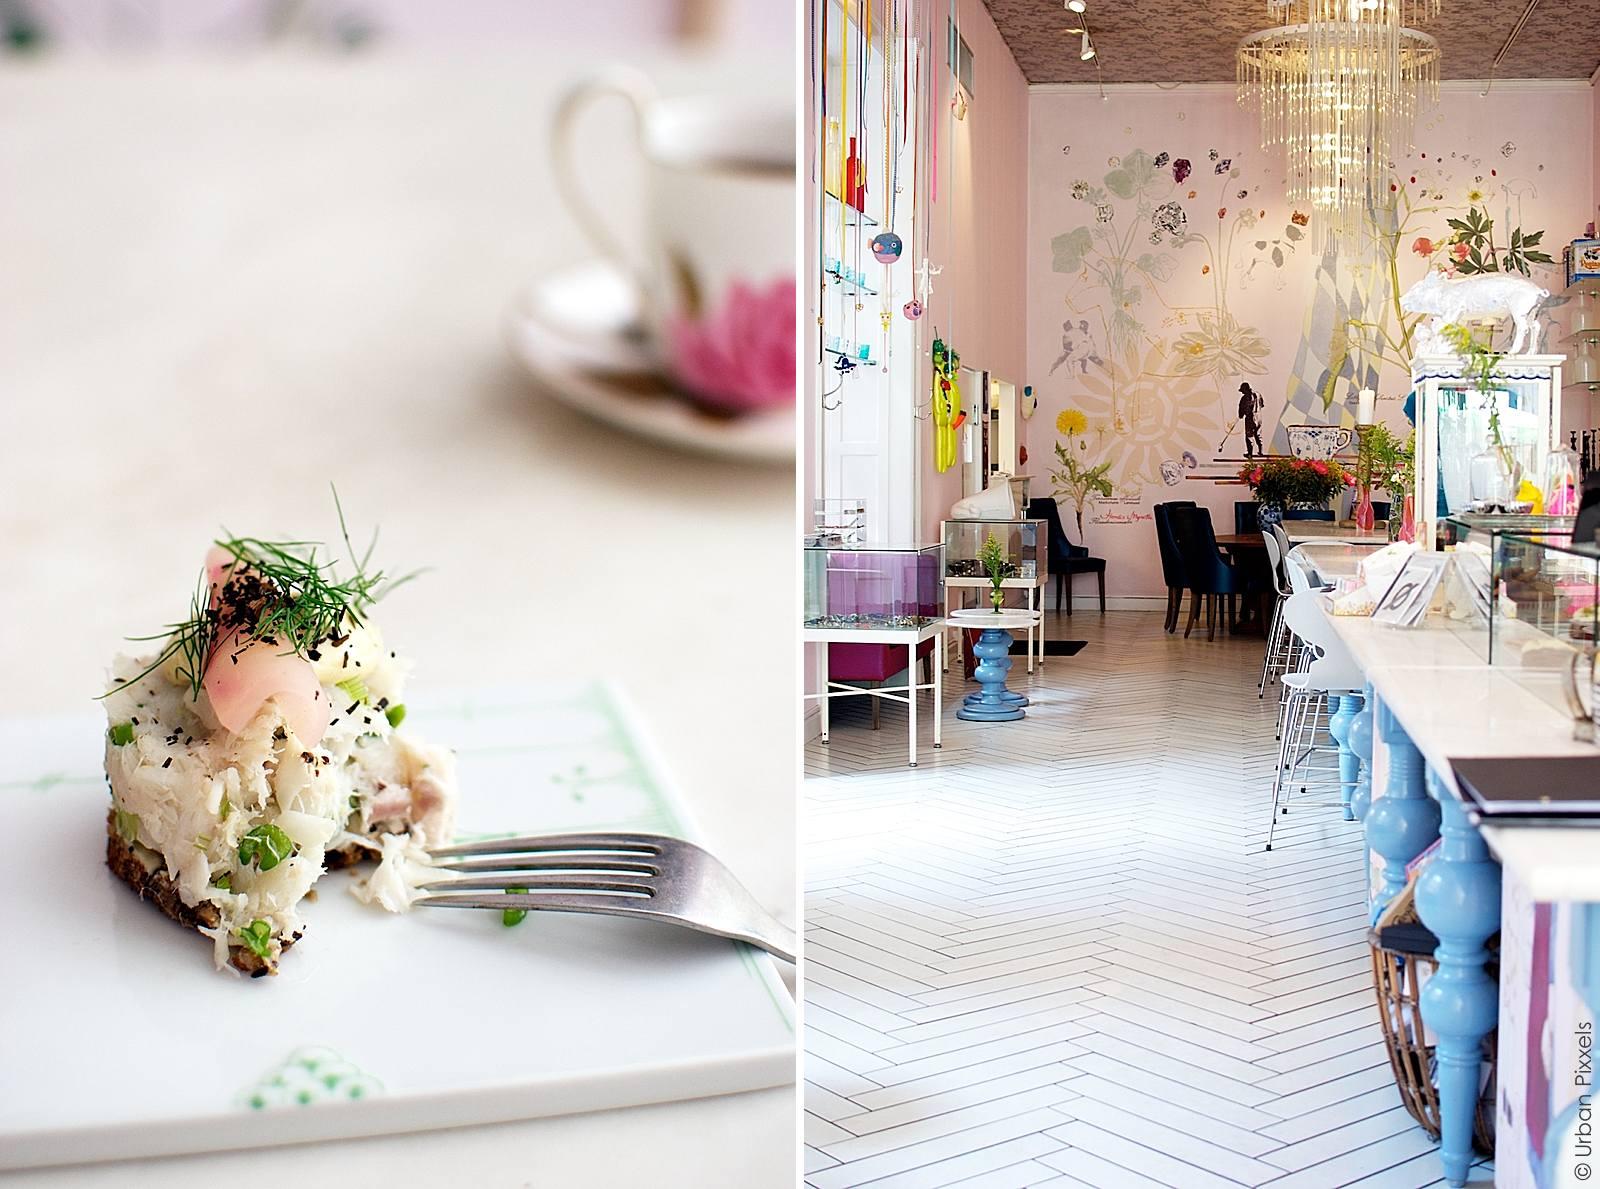 Caféen v. Royal Smushi - Rentspace